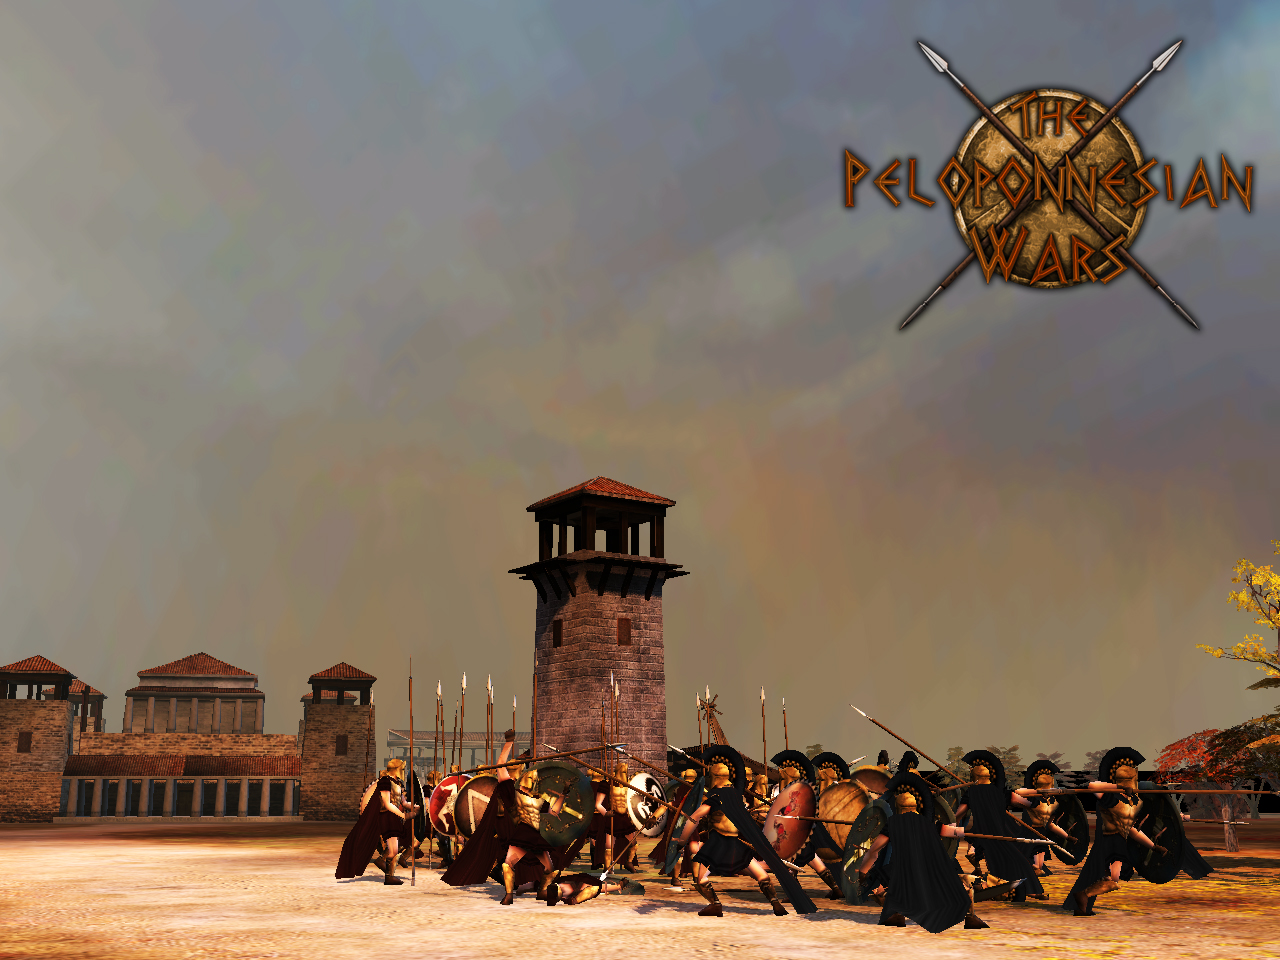 Peloponnesian war mod bfme 2 download